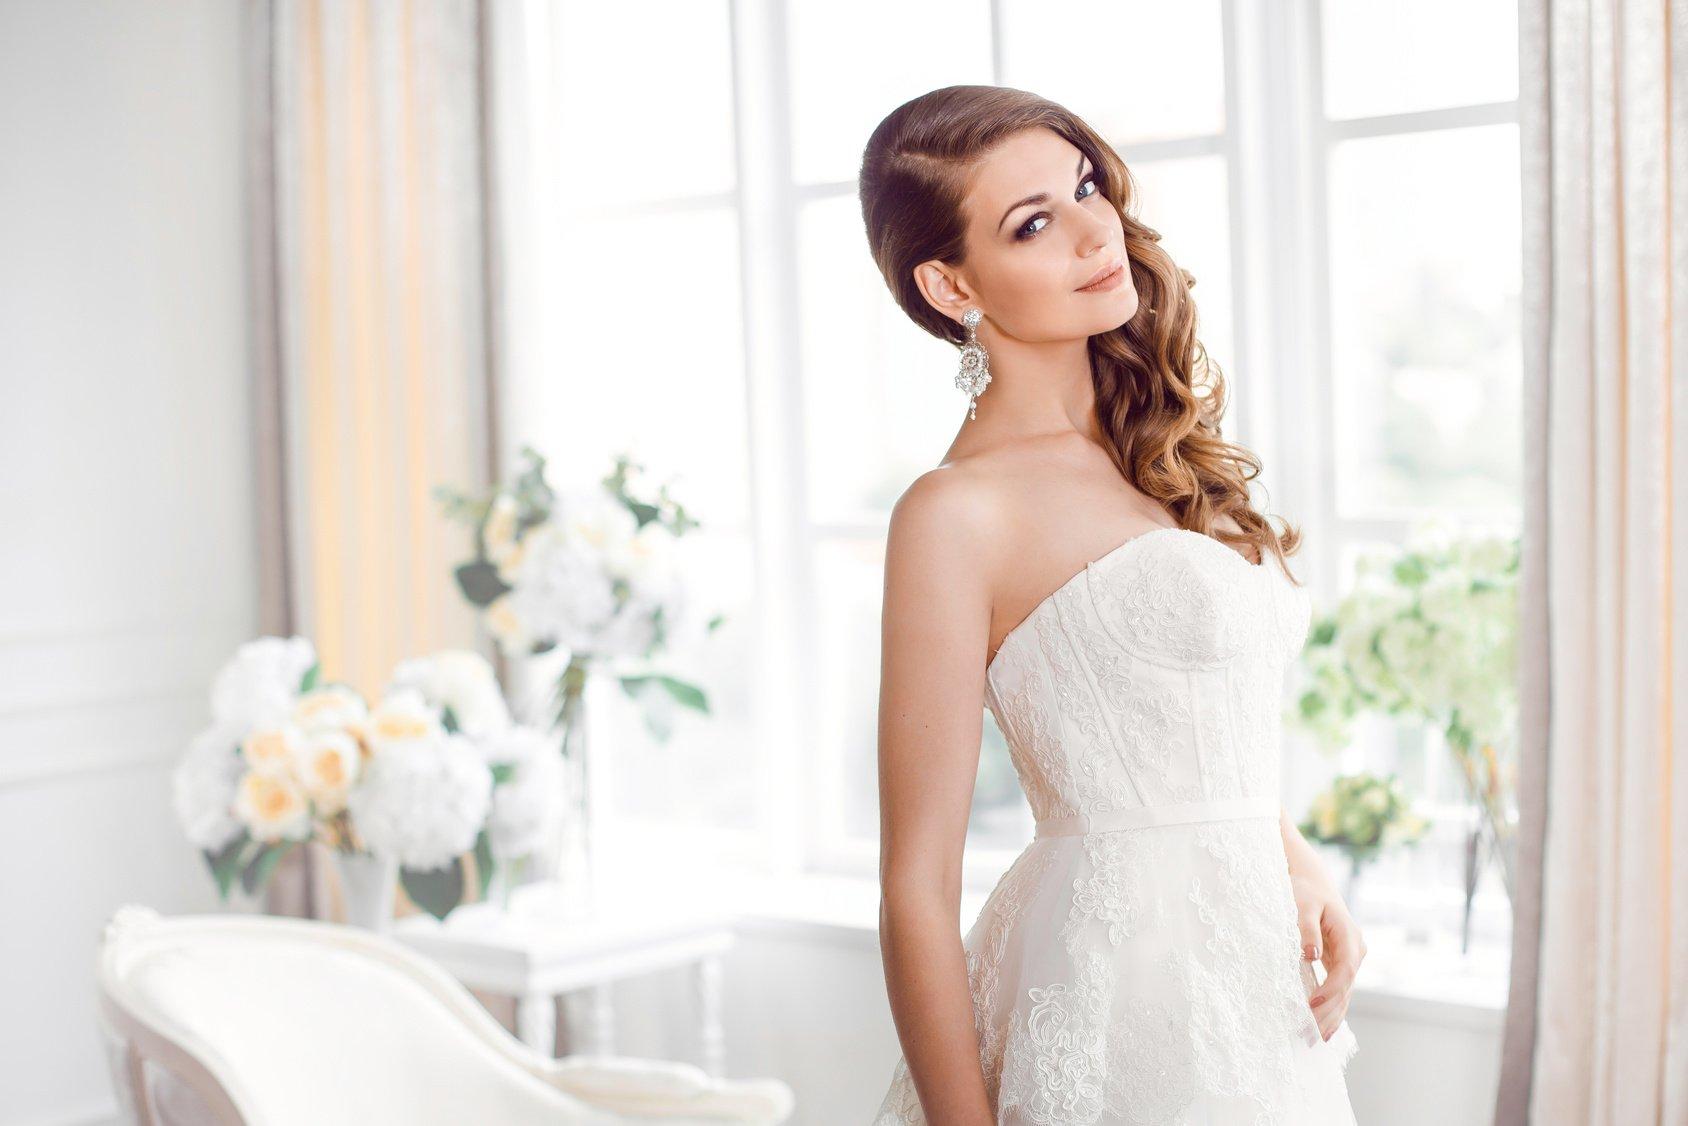 wedding hair and makeup salon stylist denver colorado